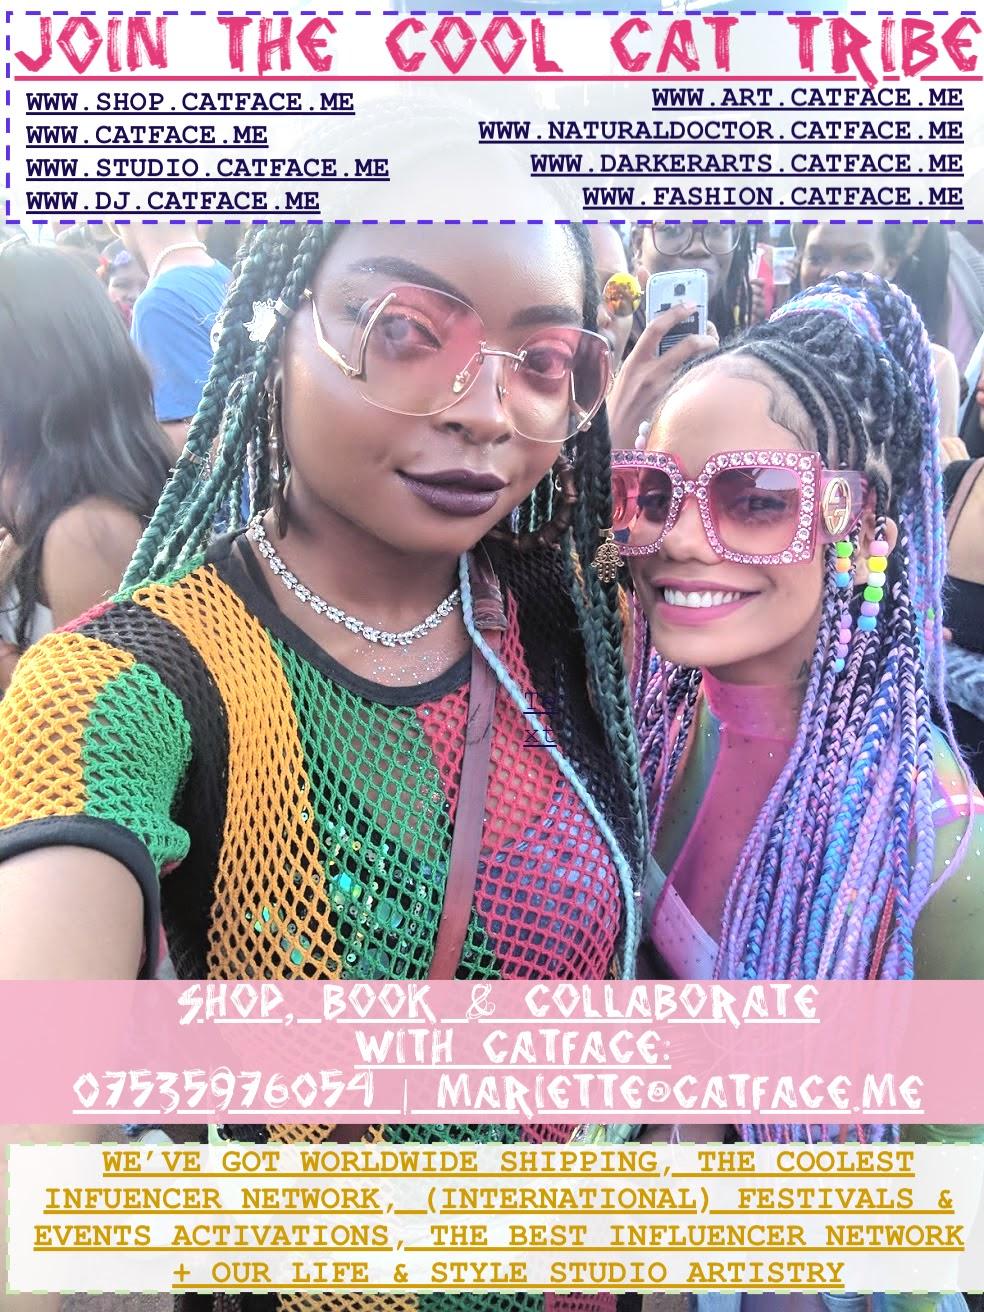 Culture; Art, Style Music, Travel, Events, Blog & Community